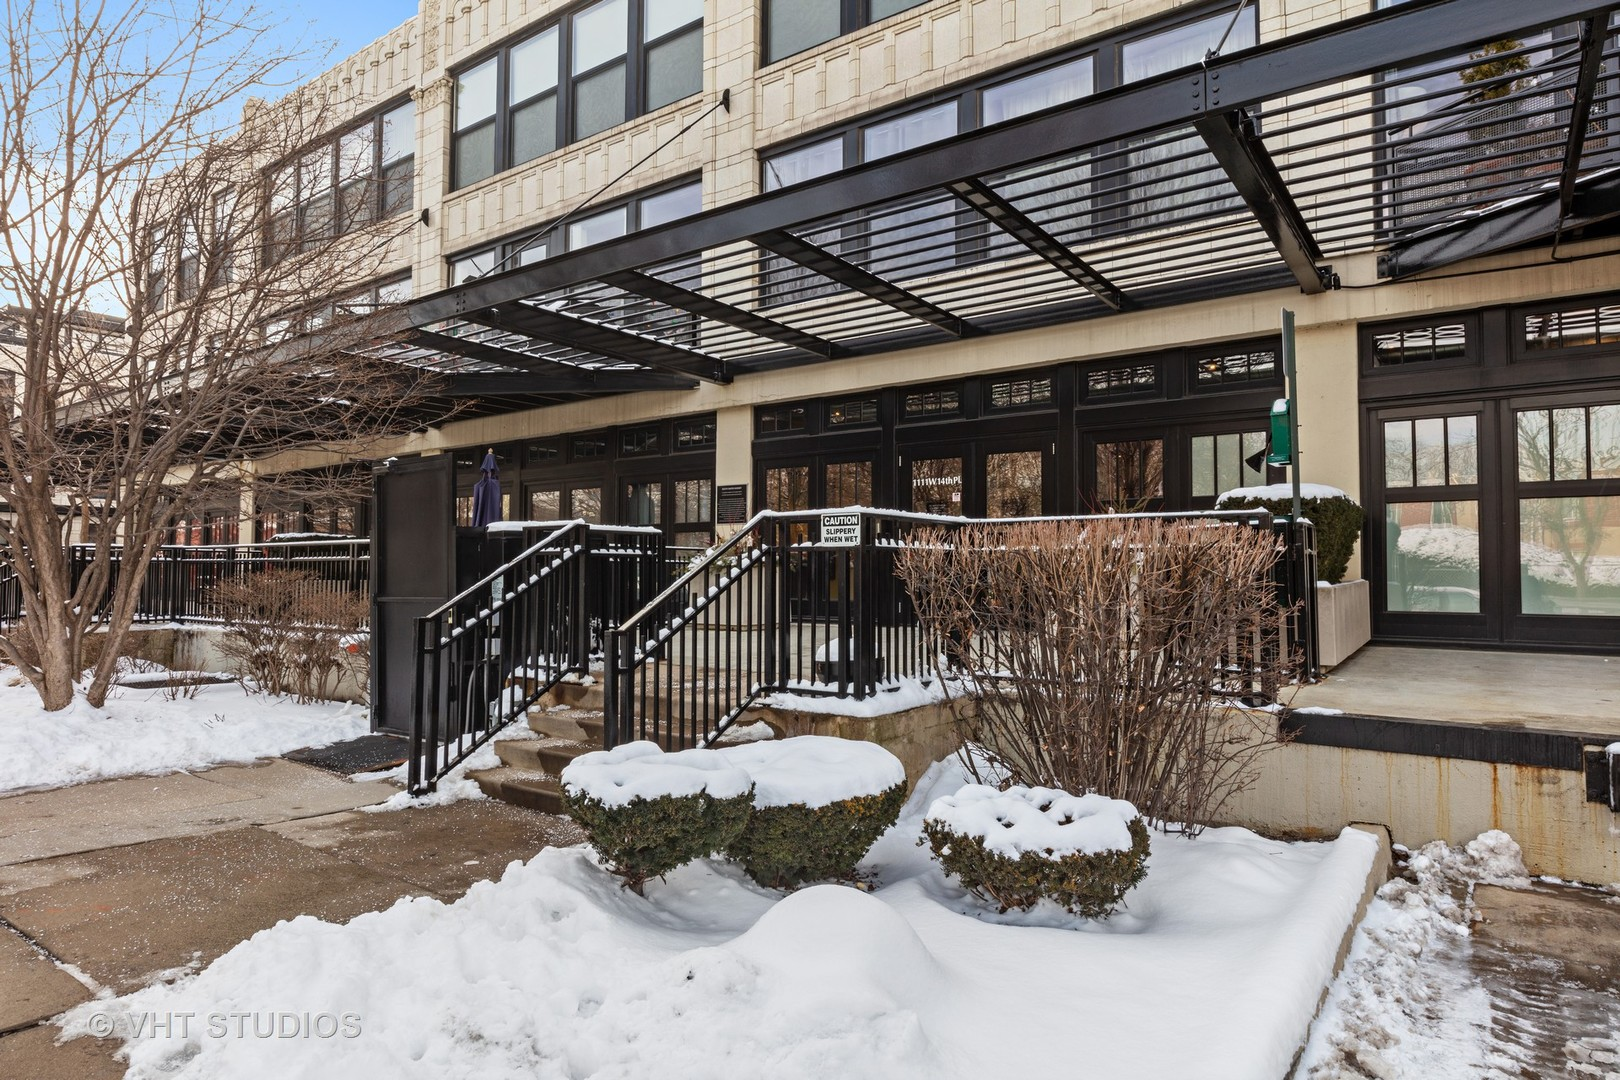 1111 14th Unit Unit 110 ,Chicago, Illinois 60608